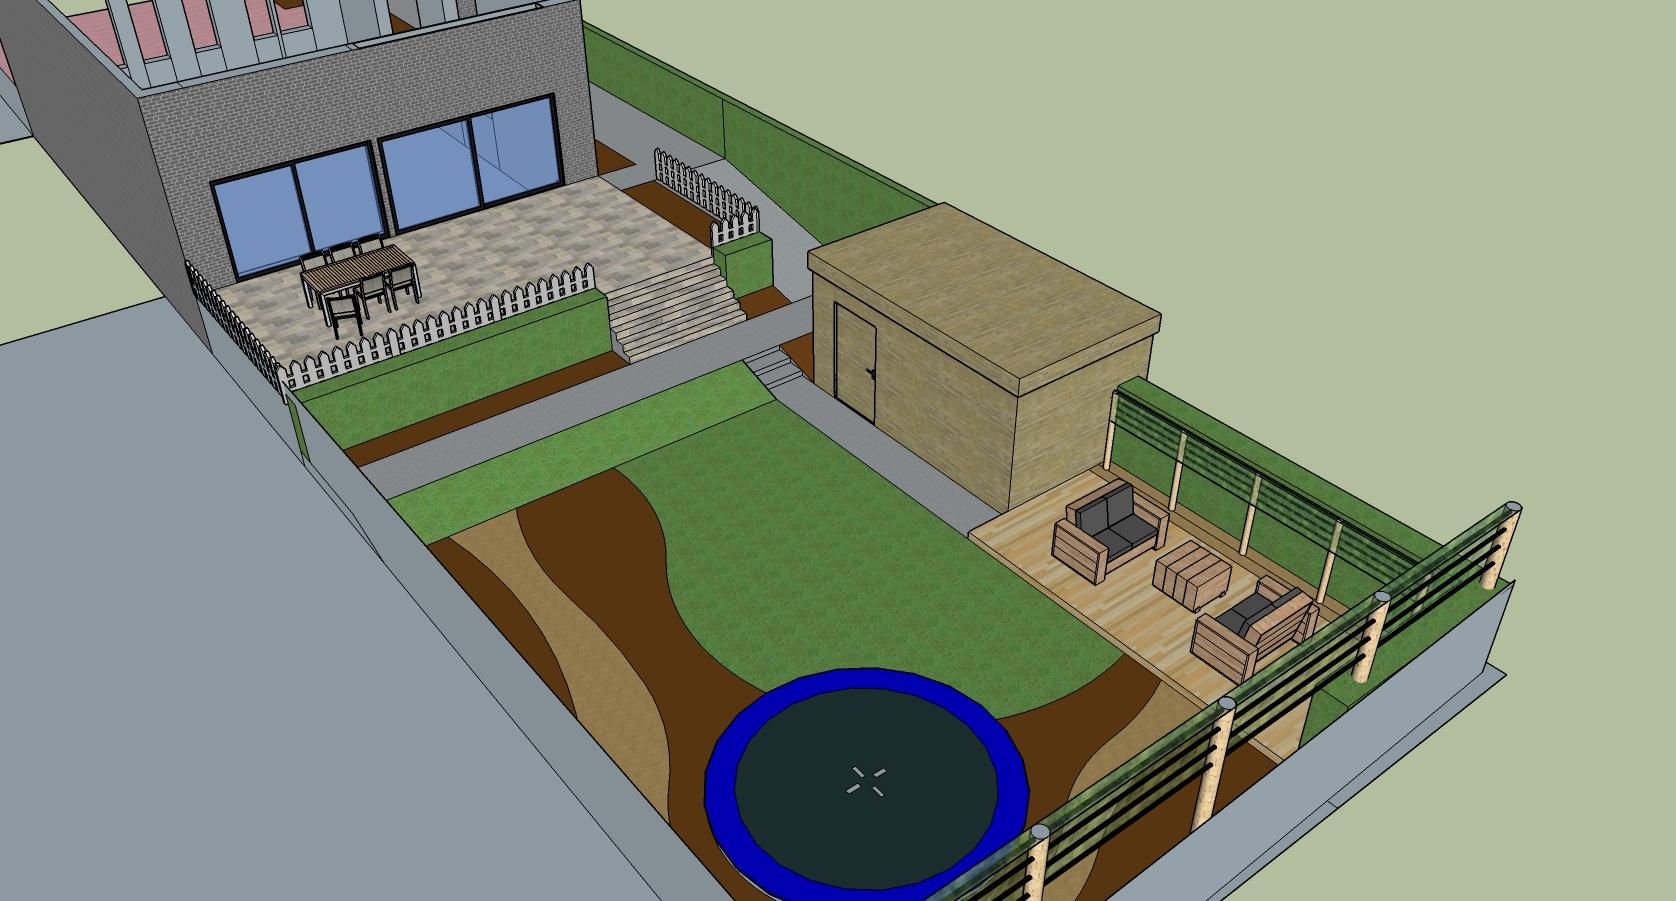 Kindvriendelijke Tuin Ideeen : Kindvriendelijke tuin te marke liv green tuinarchitect